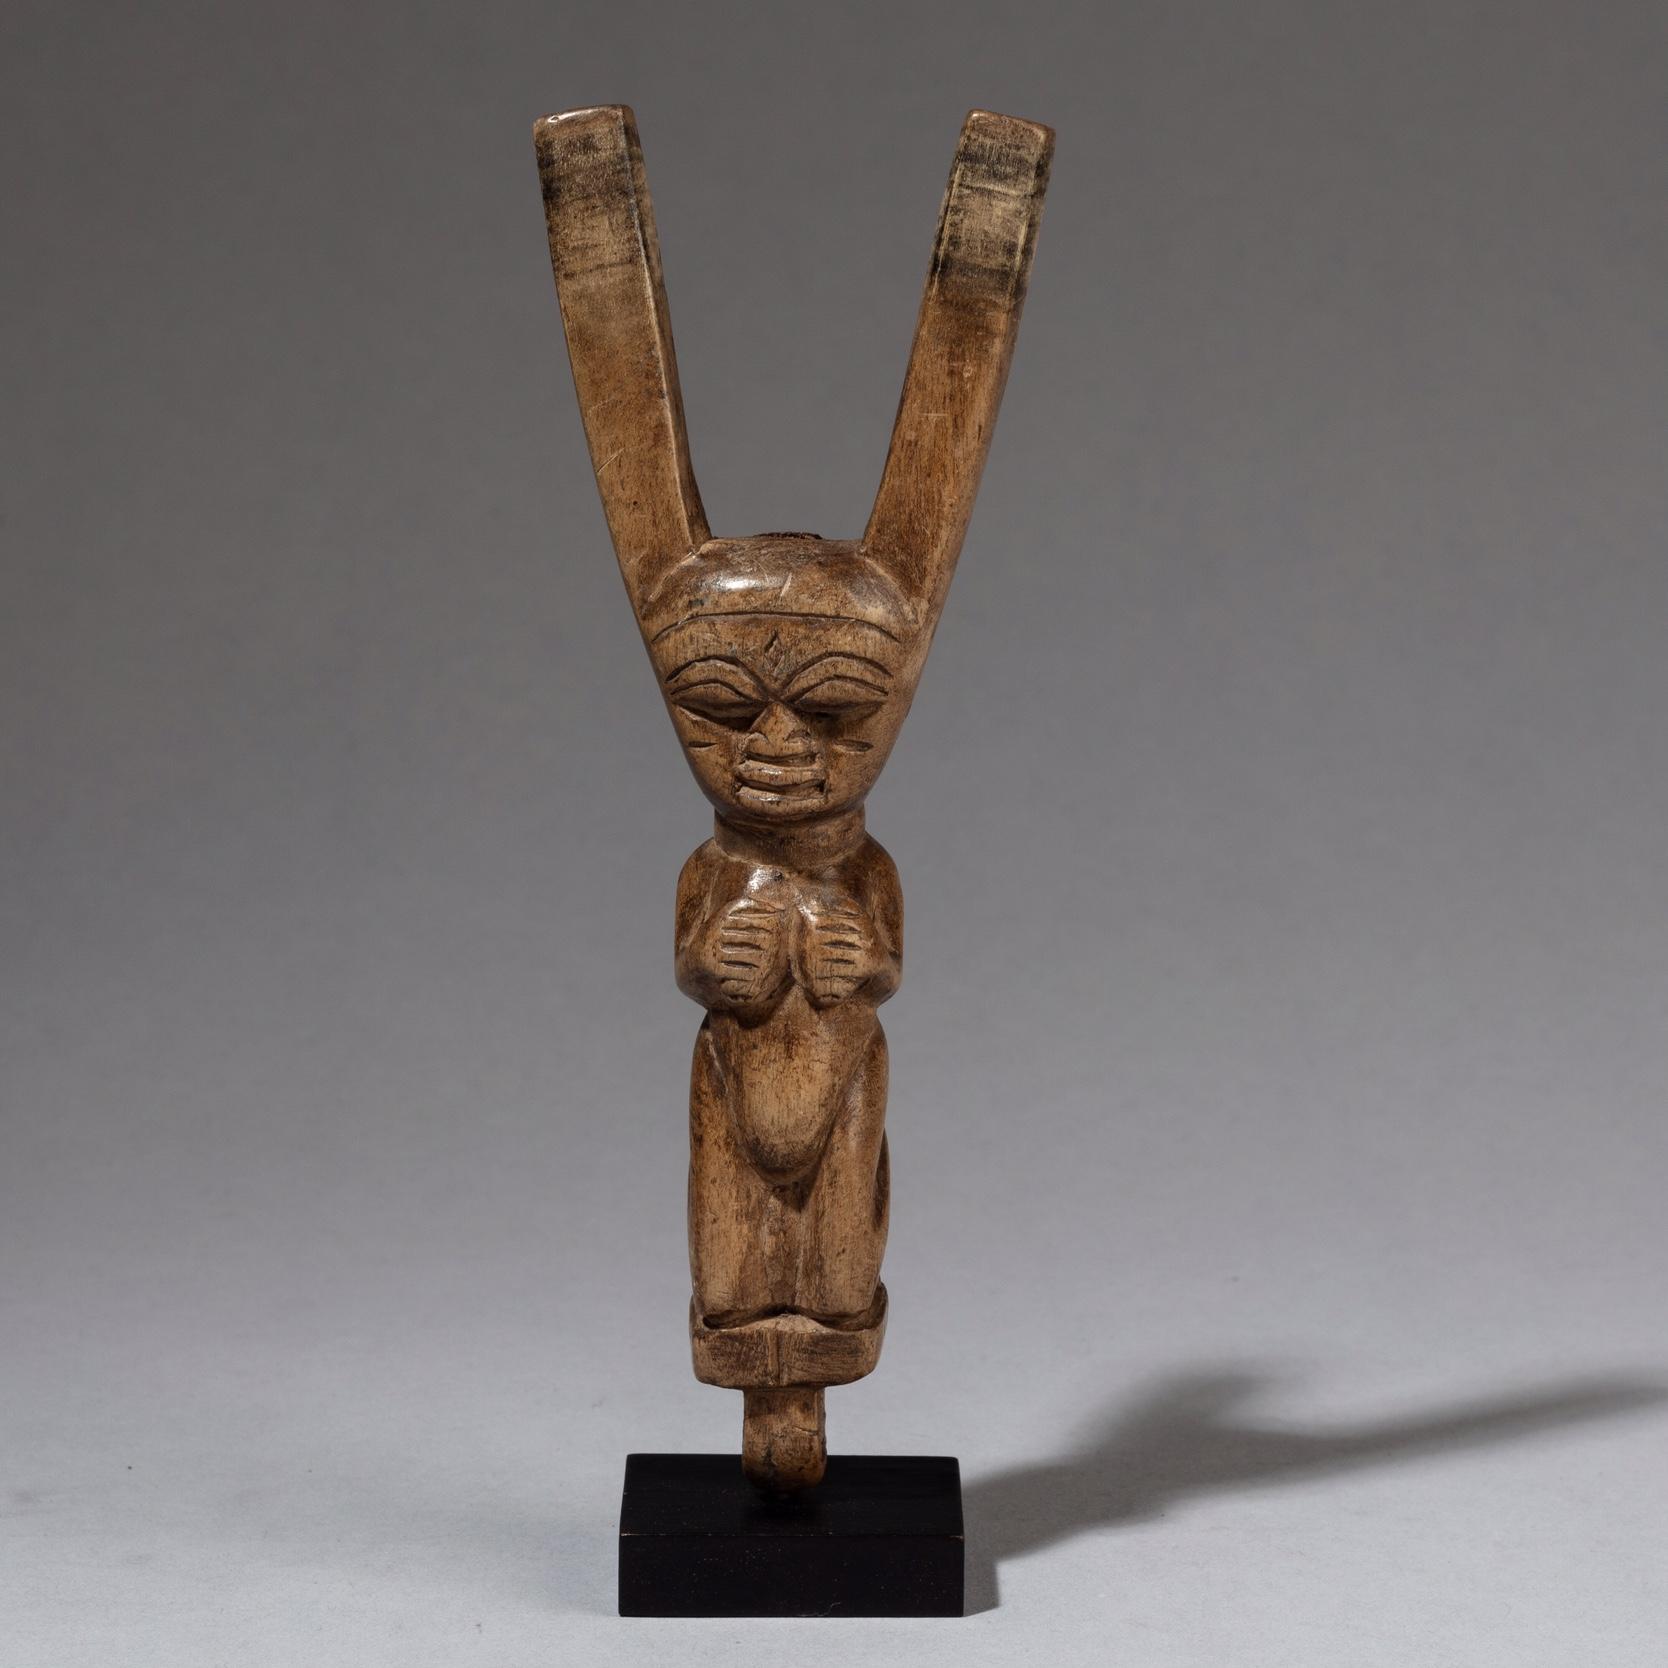 A TALL +ELABORATE FIGURATIVE CATAPULT FROM YORUBA TRIBE NIGERIA  ( No 3386 )